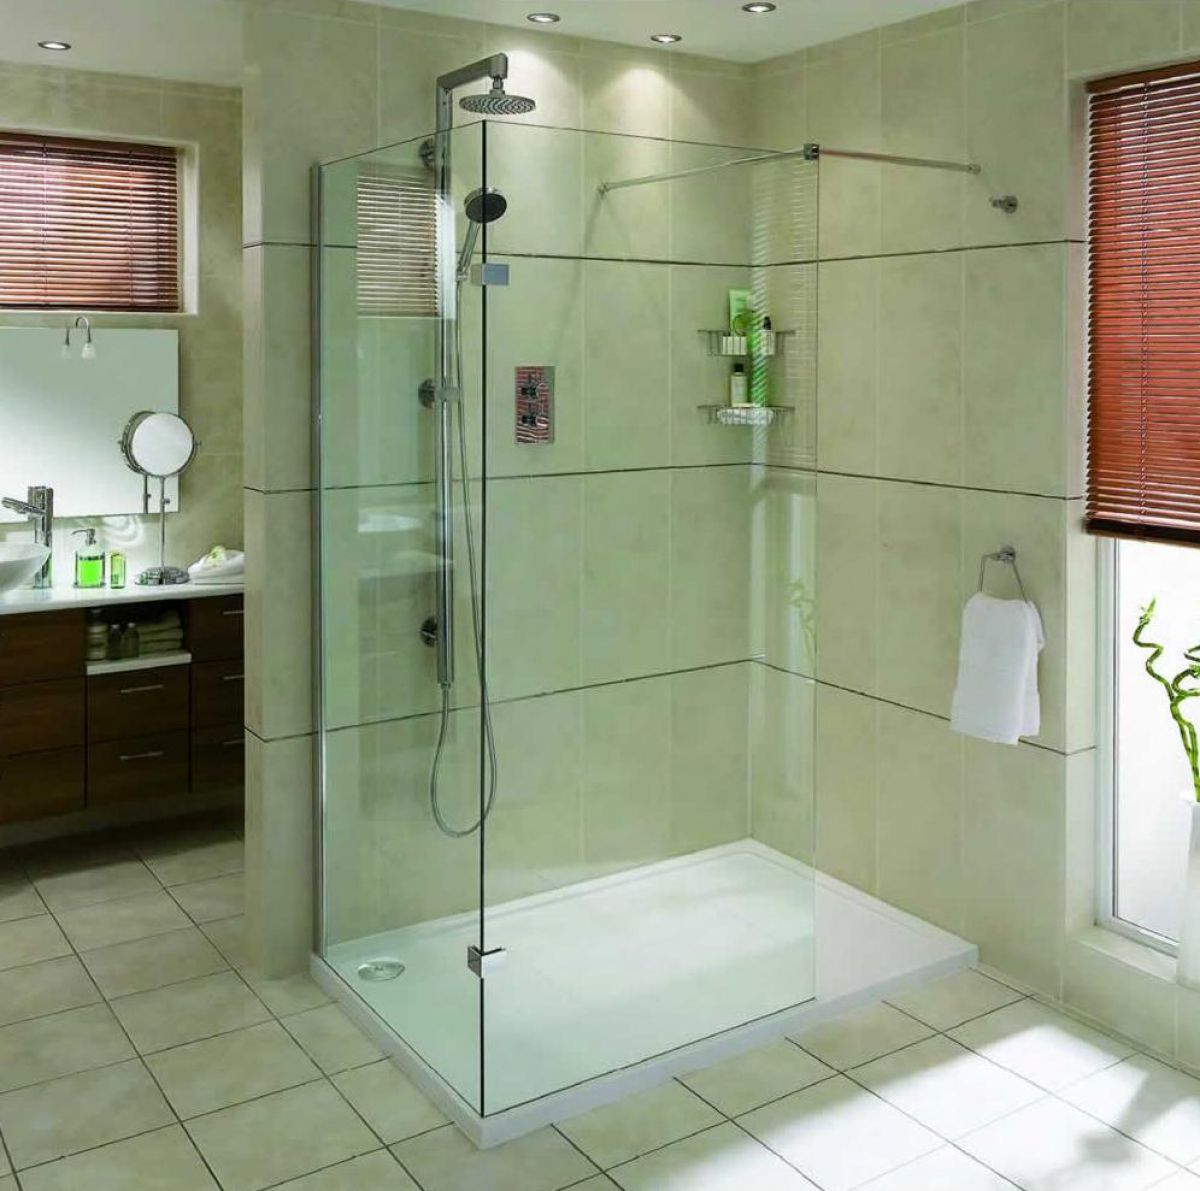 Aqata Spectra Walk In Shower Enclosure SP410 (Corner)